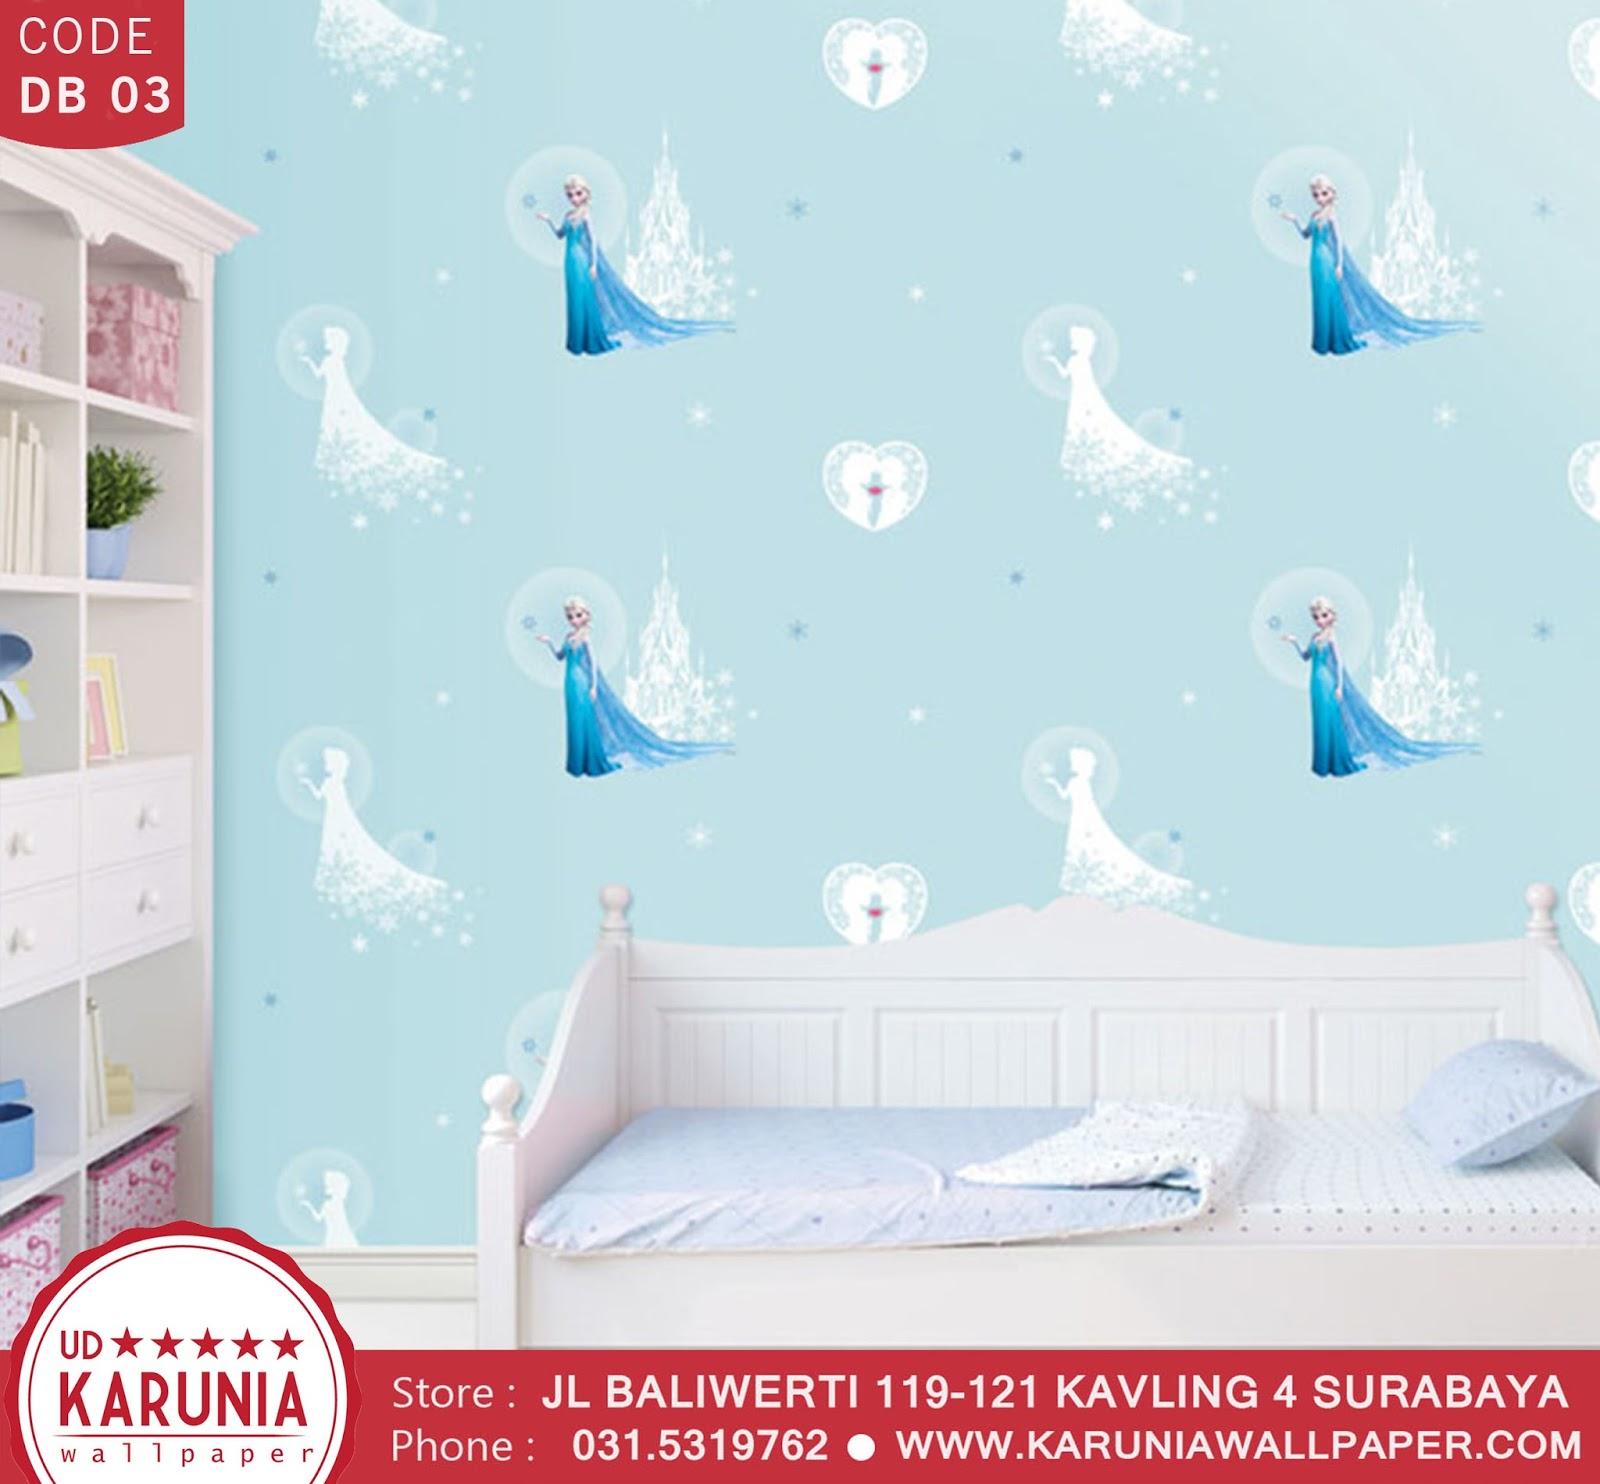 jual wallpaper dinding frozen karuniawallpaper surabaya